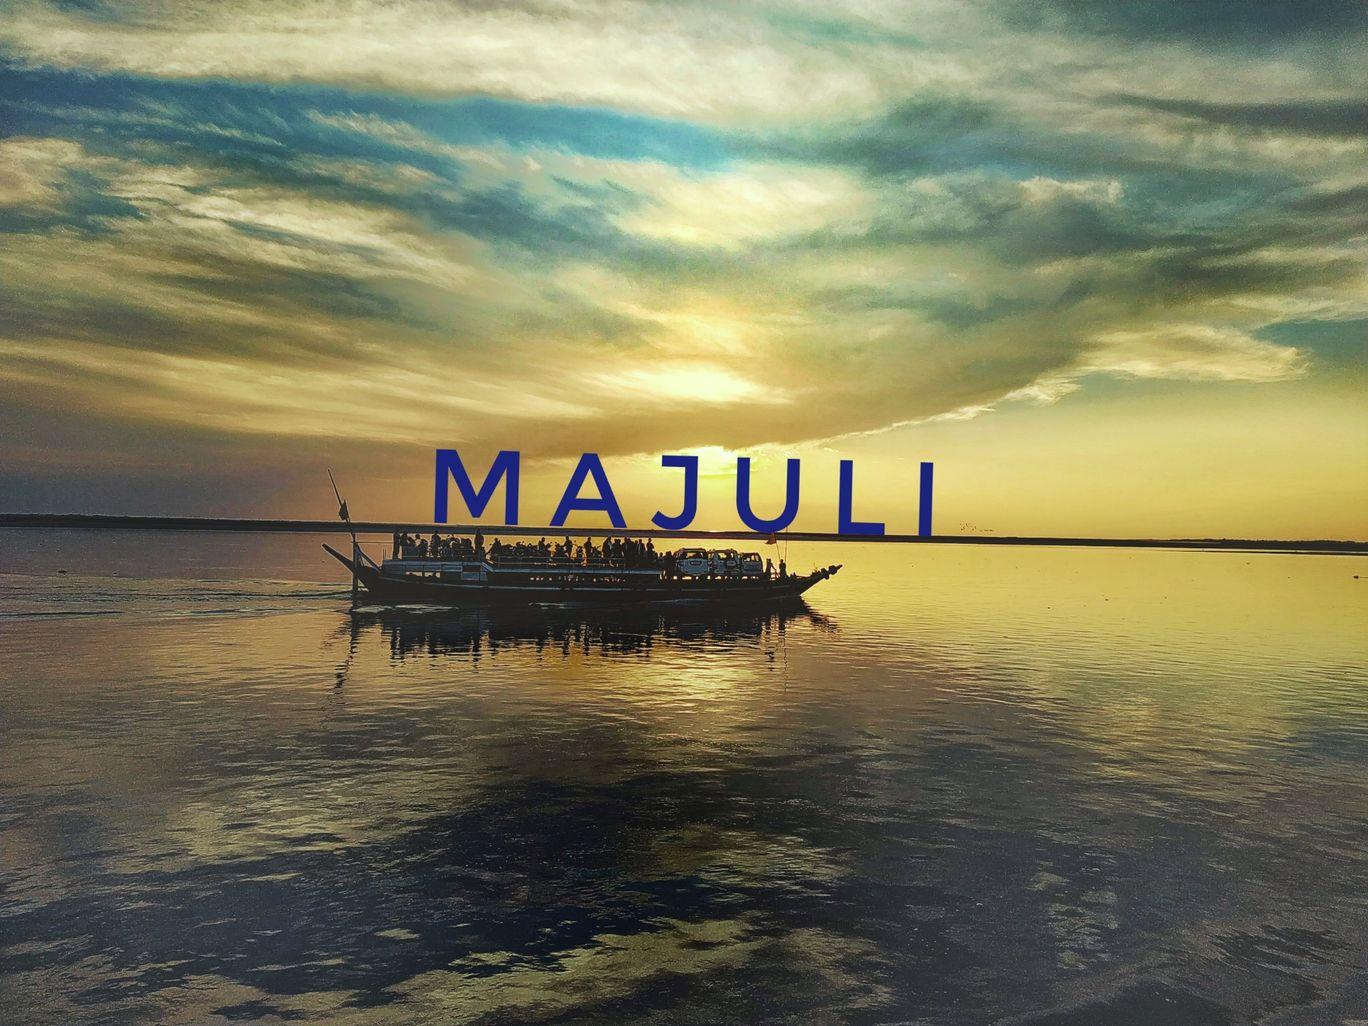 Photo of Majuli By Rohit Saikia